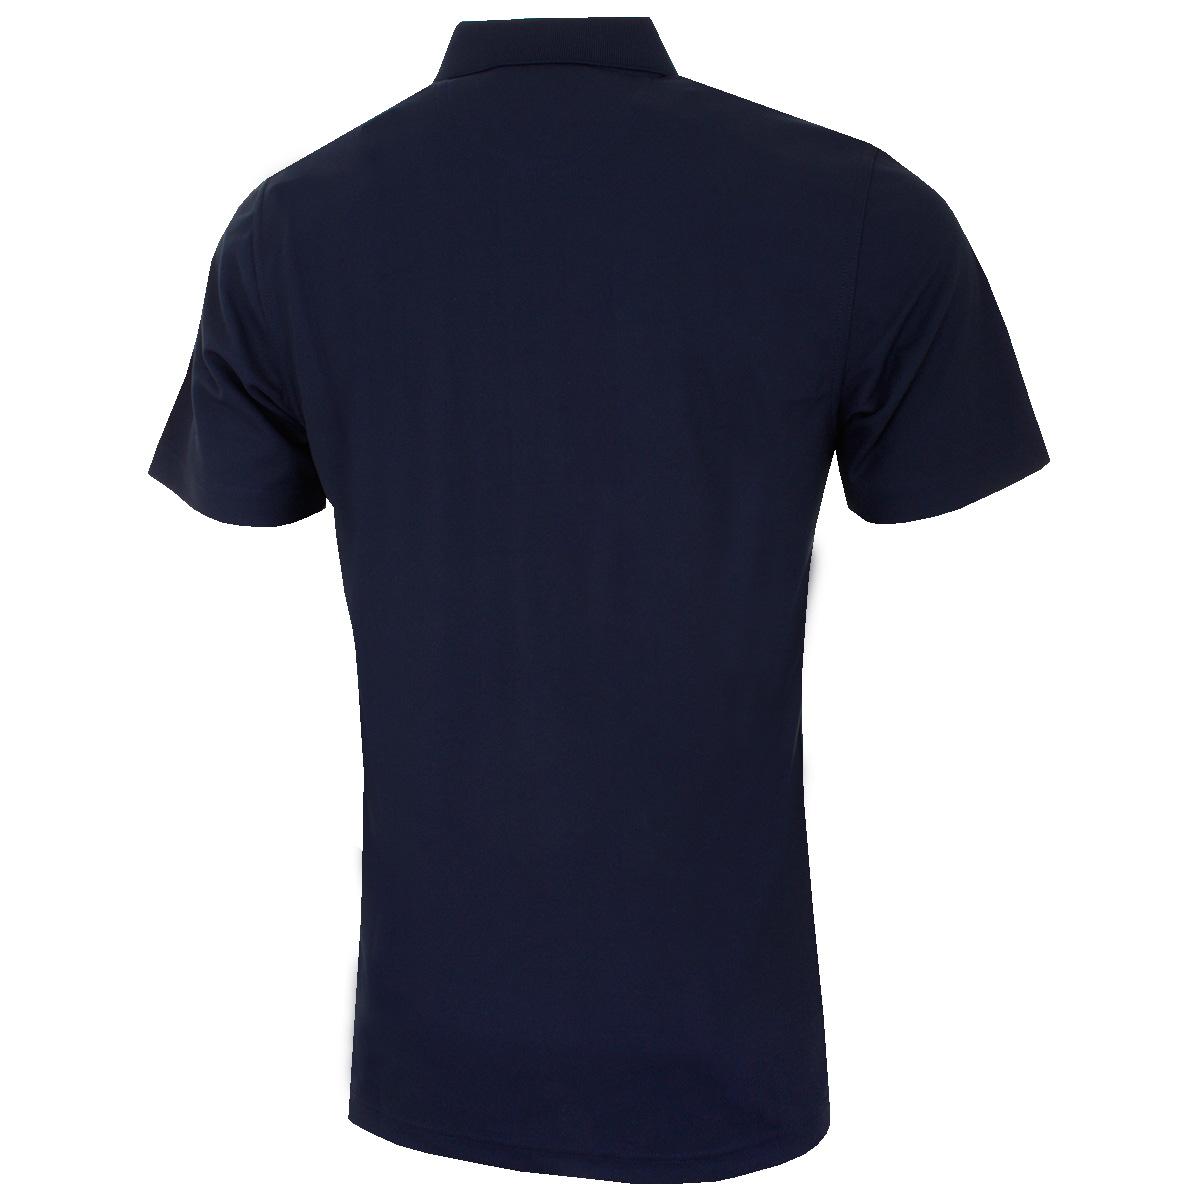 Greg-Norman-Mens-KX04-Performance-Micro-Pique-Golf-Polo-Shirt-28-OFF-RRP thumbnail 50